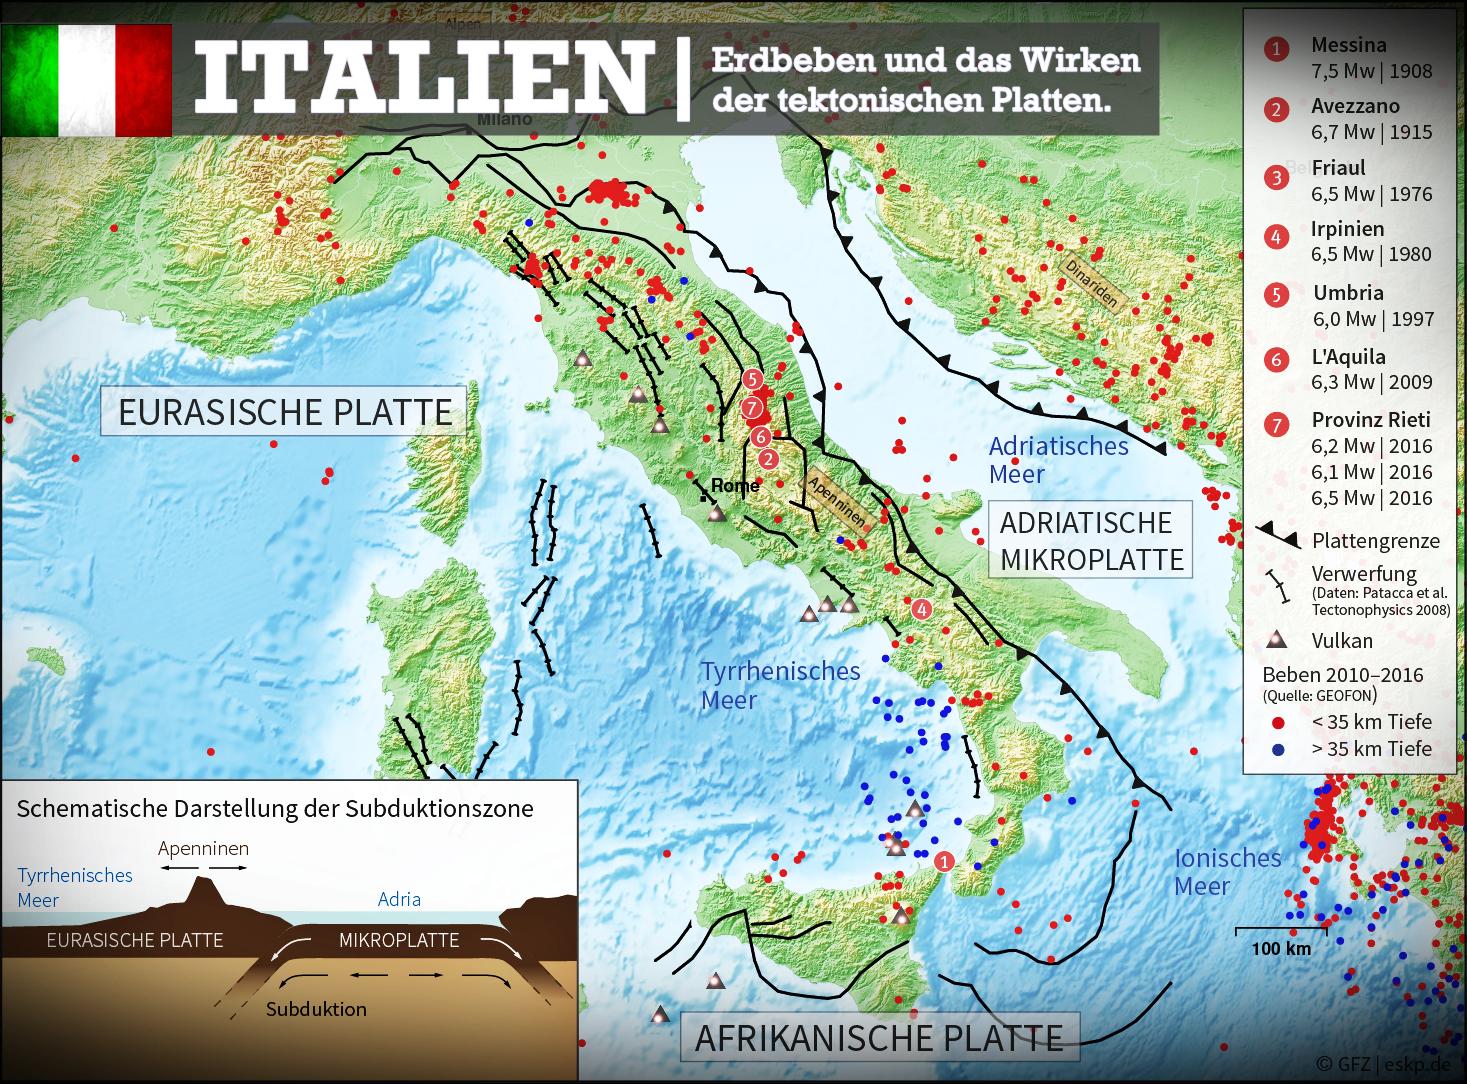 italien karte erdbeben Italien: Erdbeben Karte. | Erdbeben, Italien, Karten